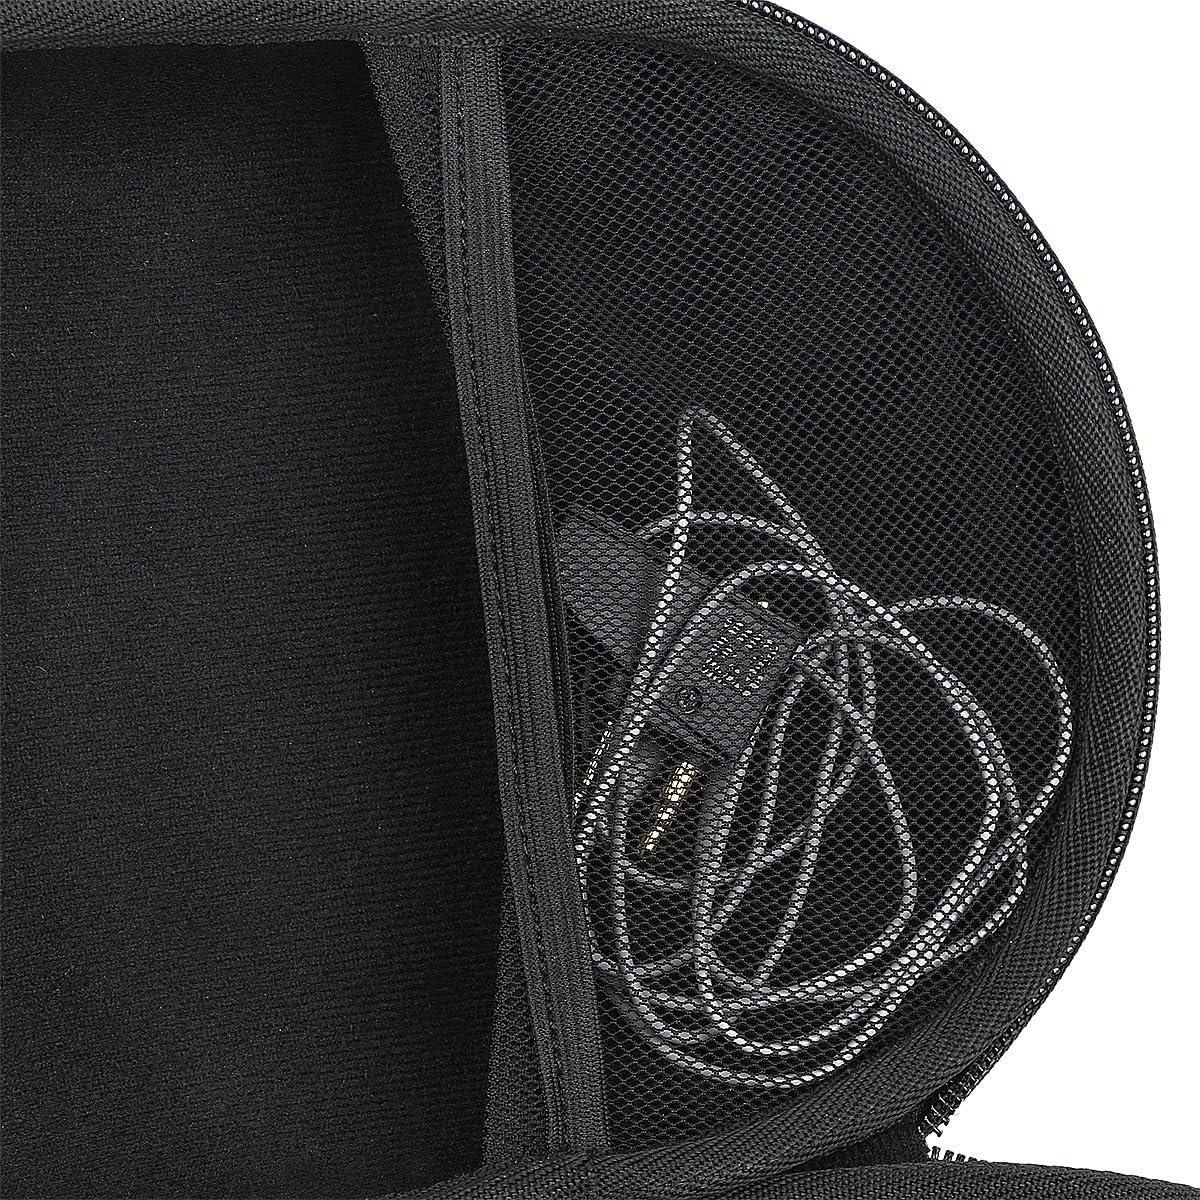 Khanka Hard Travel Case Replacement for Audio-Technica ATH M50 M40X M50X M30x M50xMG Professional Studio Monitor Headphones Headset Headphone black2